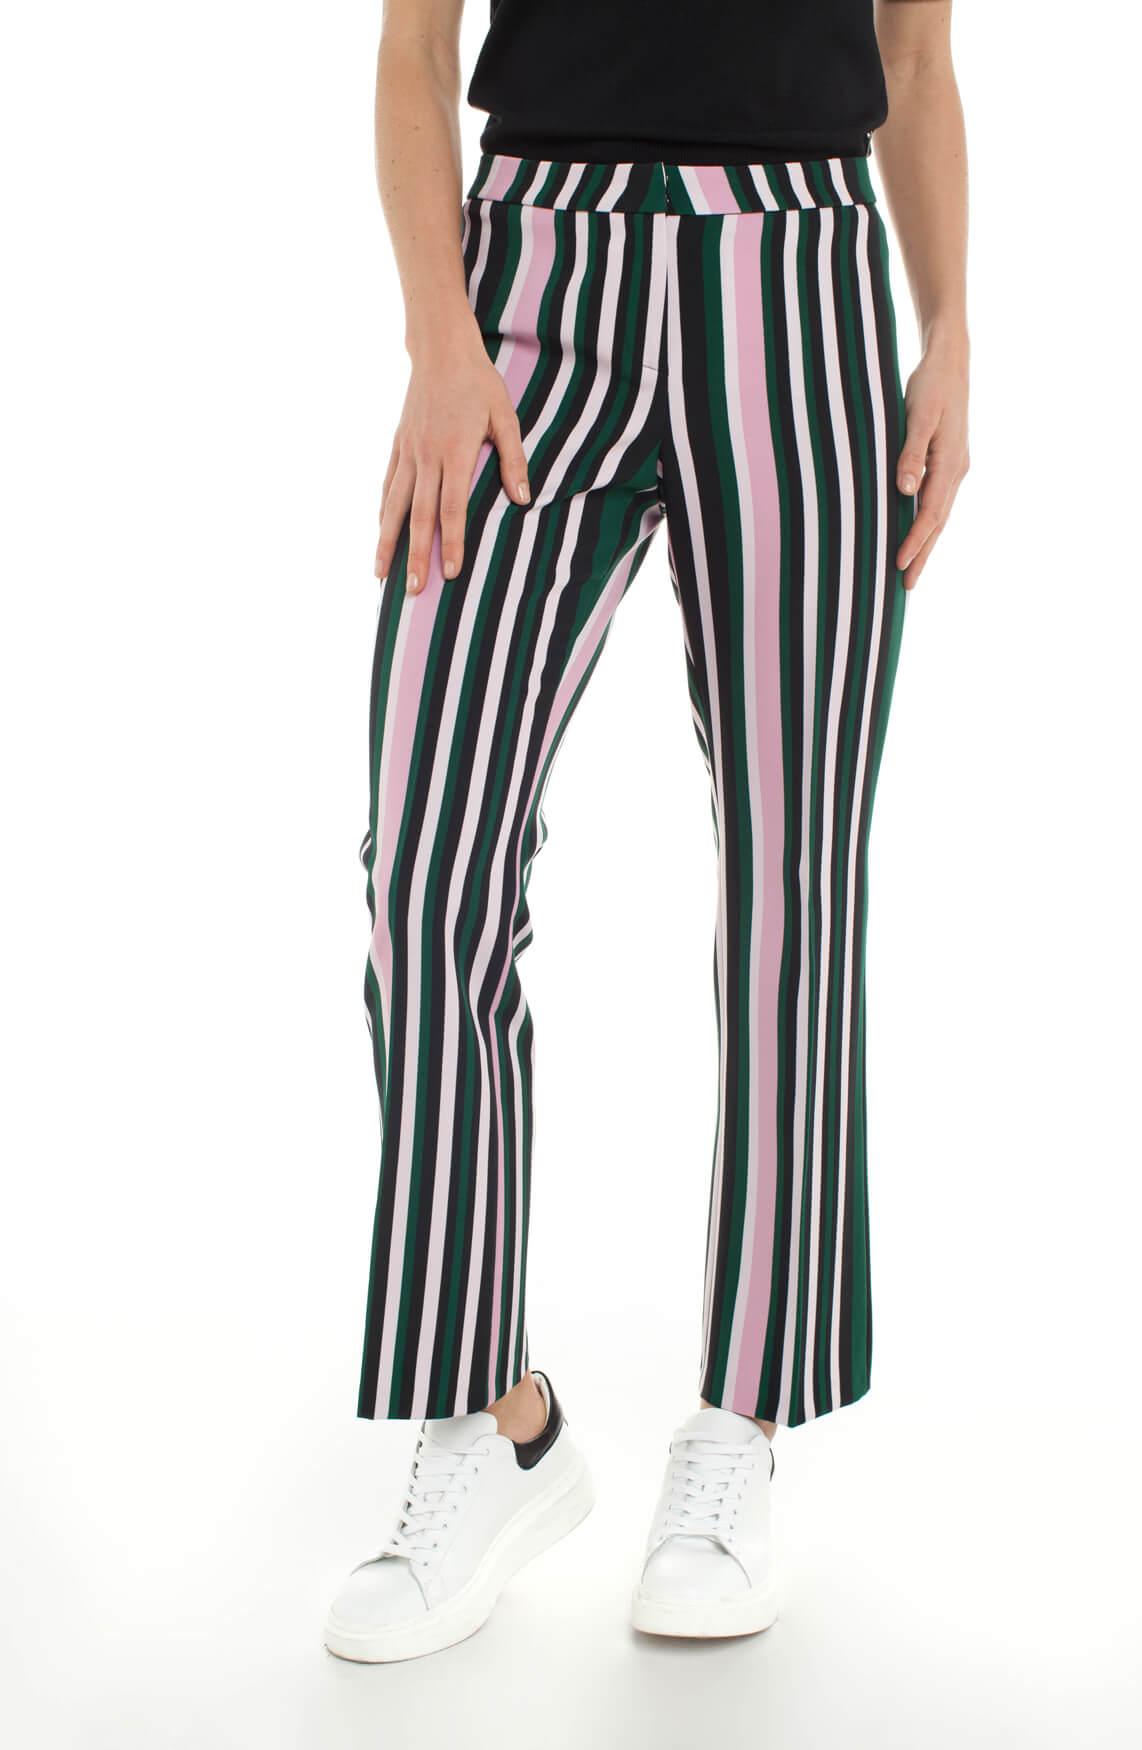 Cambio Dames Fame gestreepe pantalon zwart